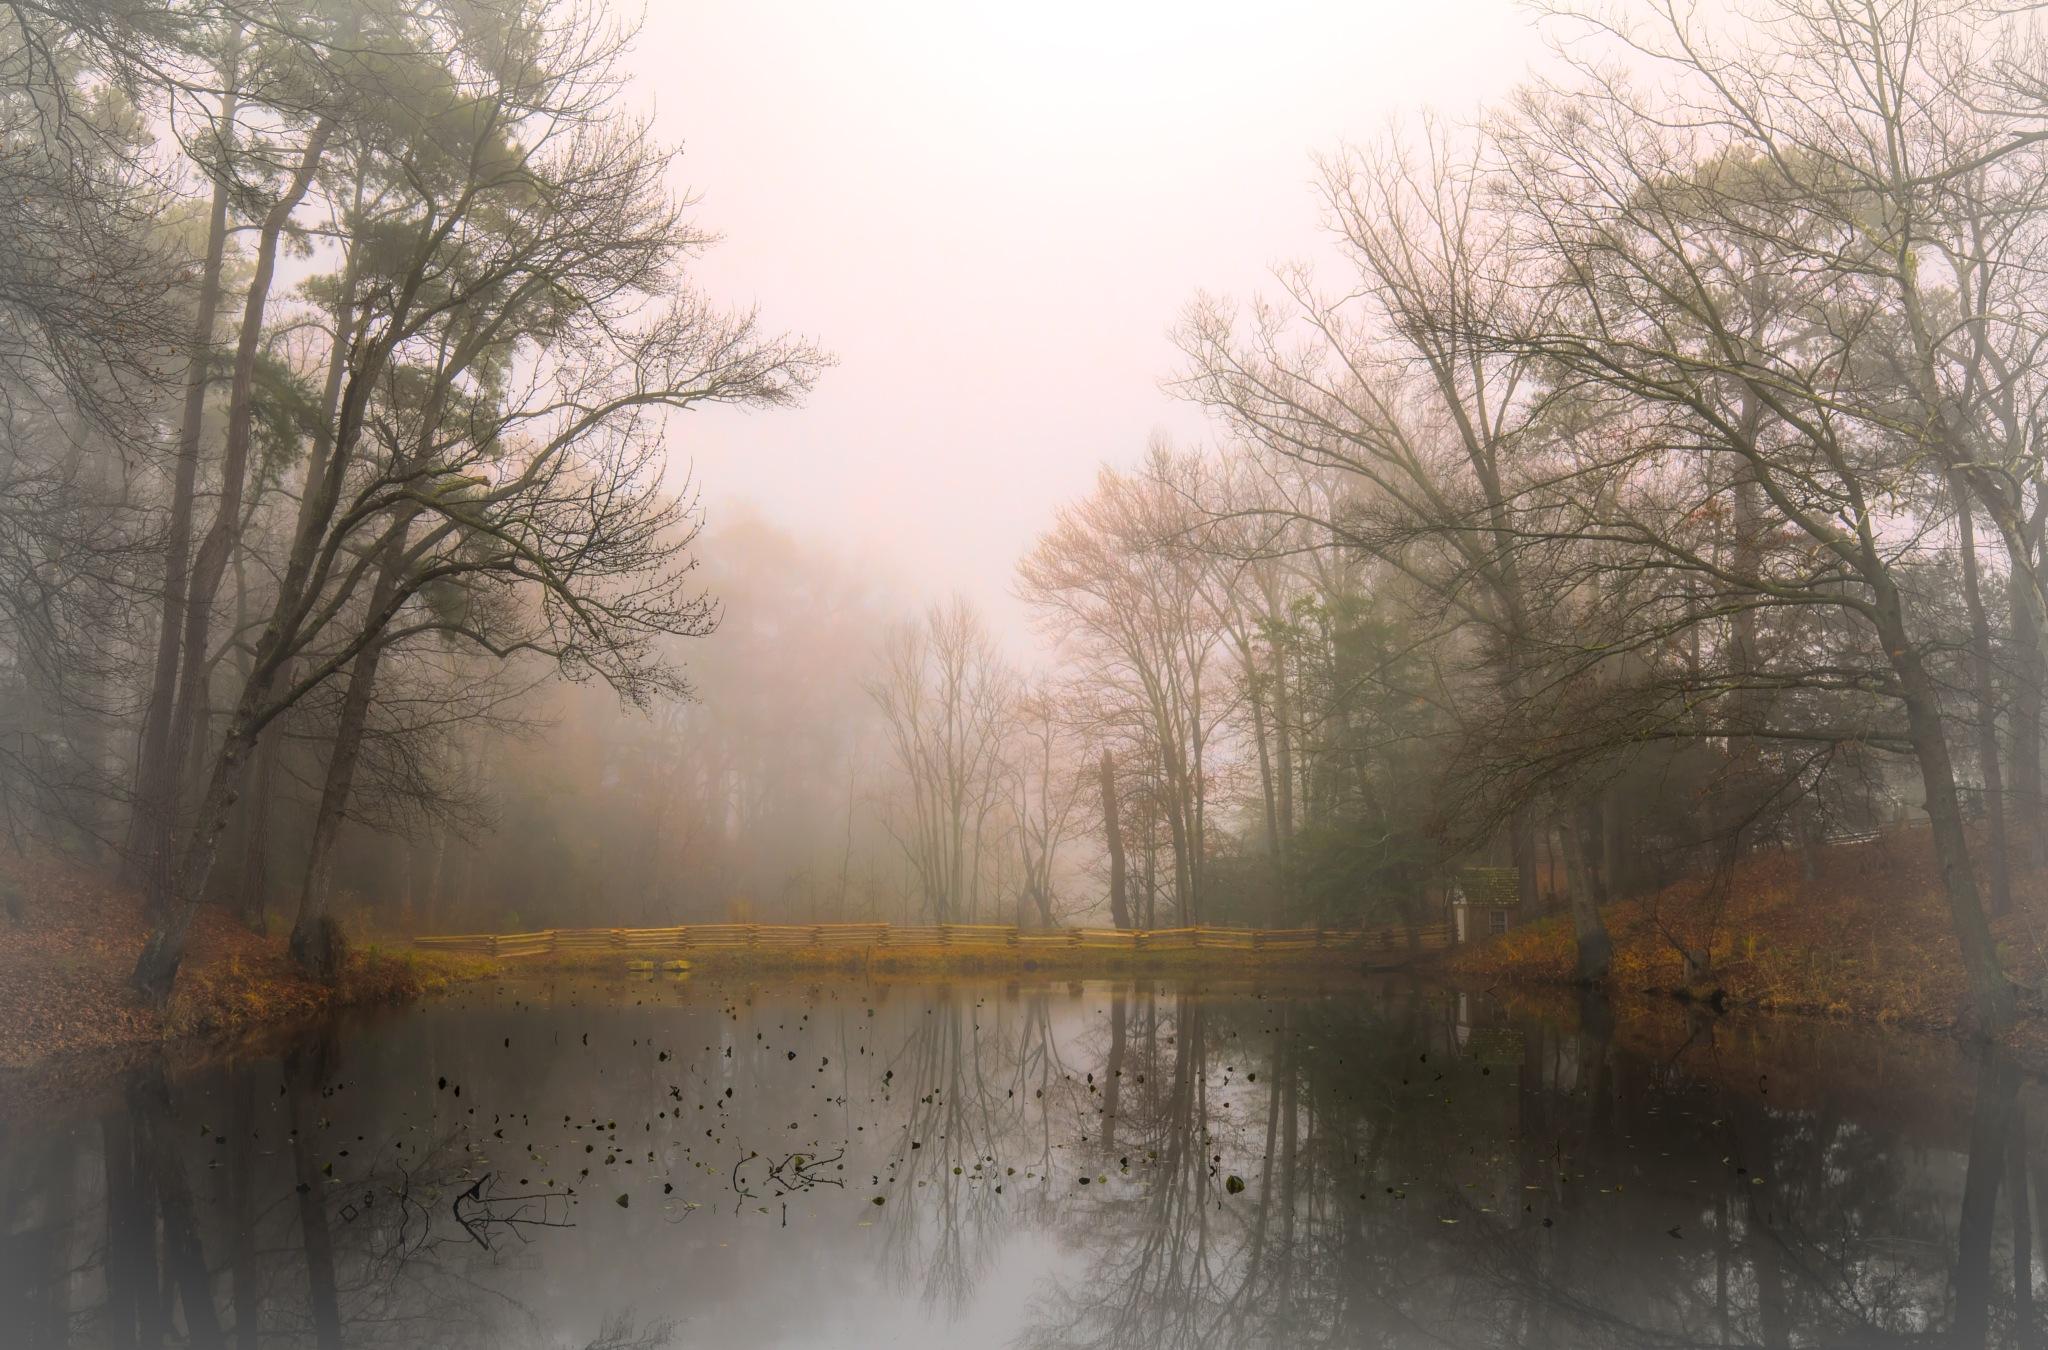 A Still Morning by Mary Carter